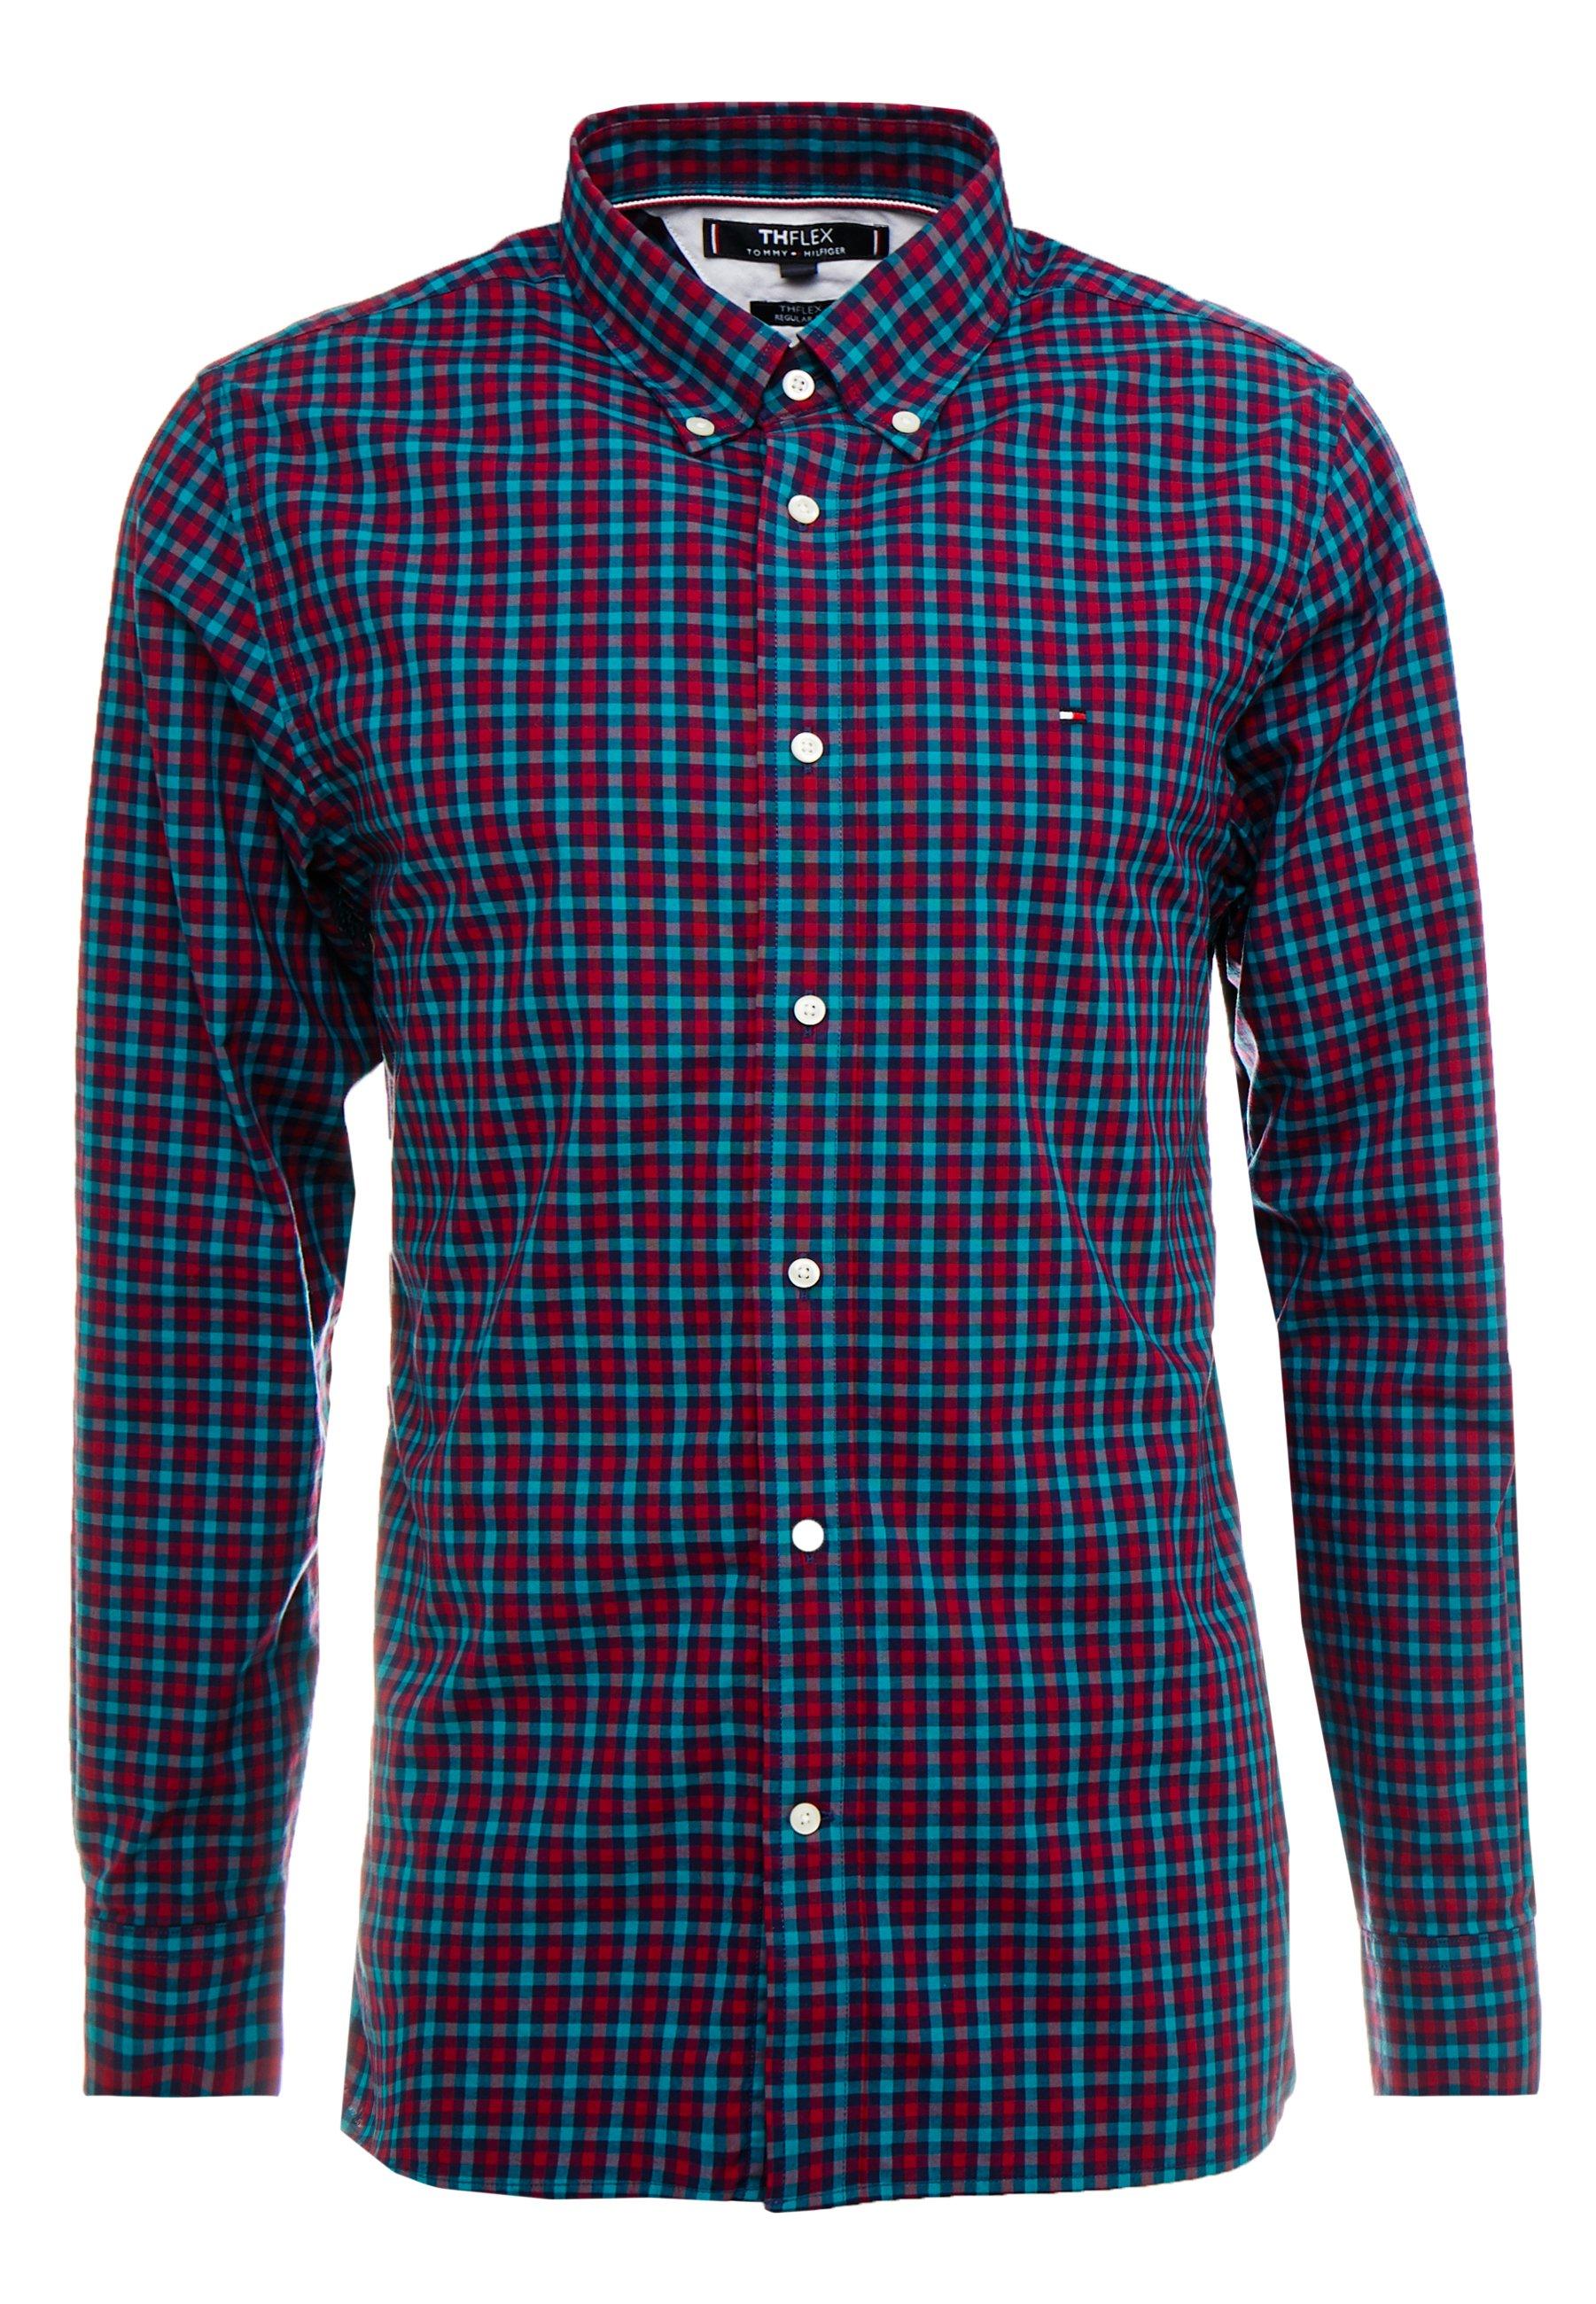 Tommy Hilfiger Flex Multi Gingham - Skjorta Dark Blue/multi-coloured